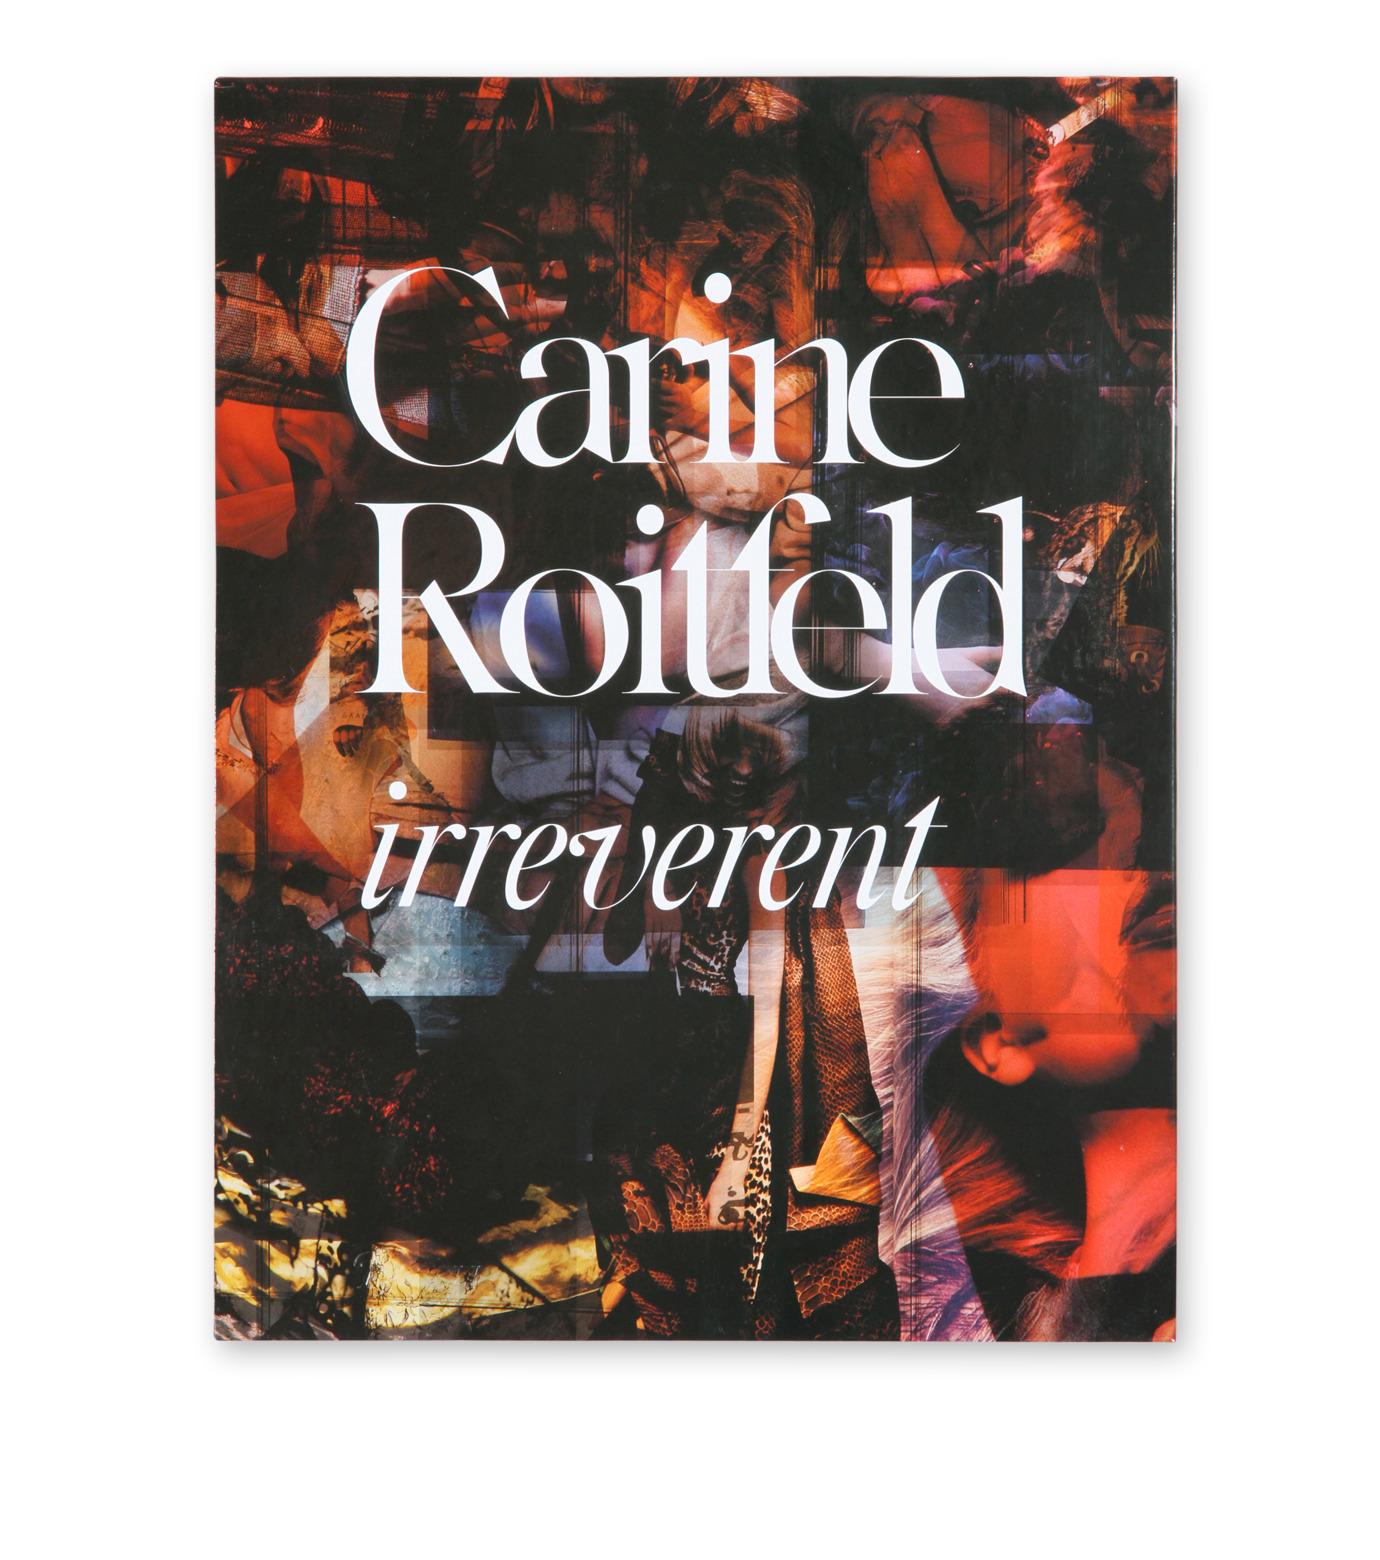 ArtBook(アートブック)のCarine Roitfeld-BLACK(インテリア/OTHER-GOODS/interior/OTHER-GOODS)-0847833689-13 拡大詳細画像1